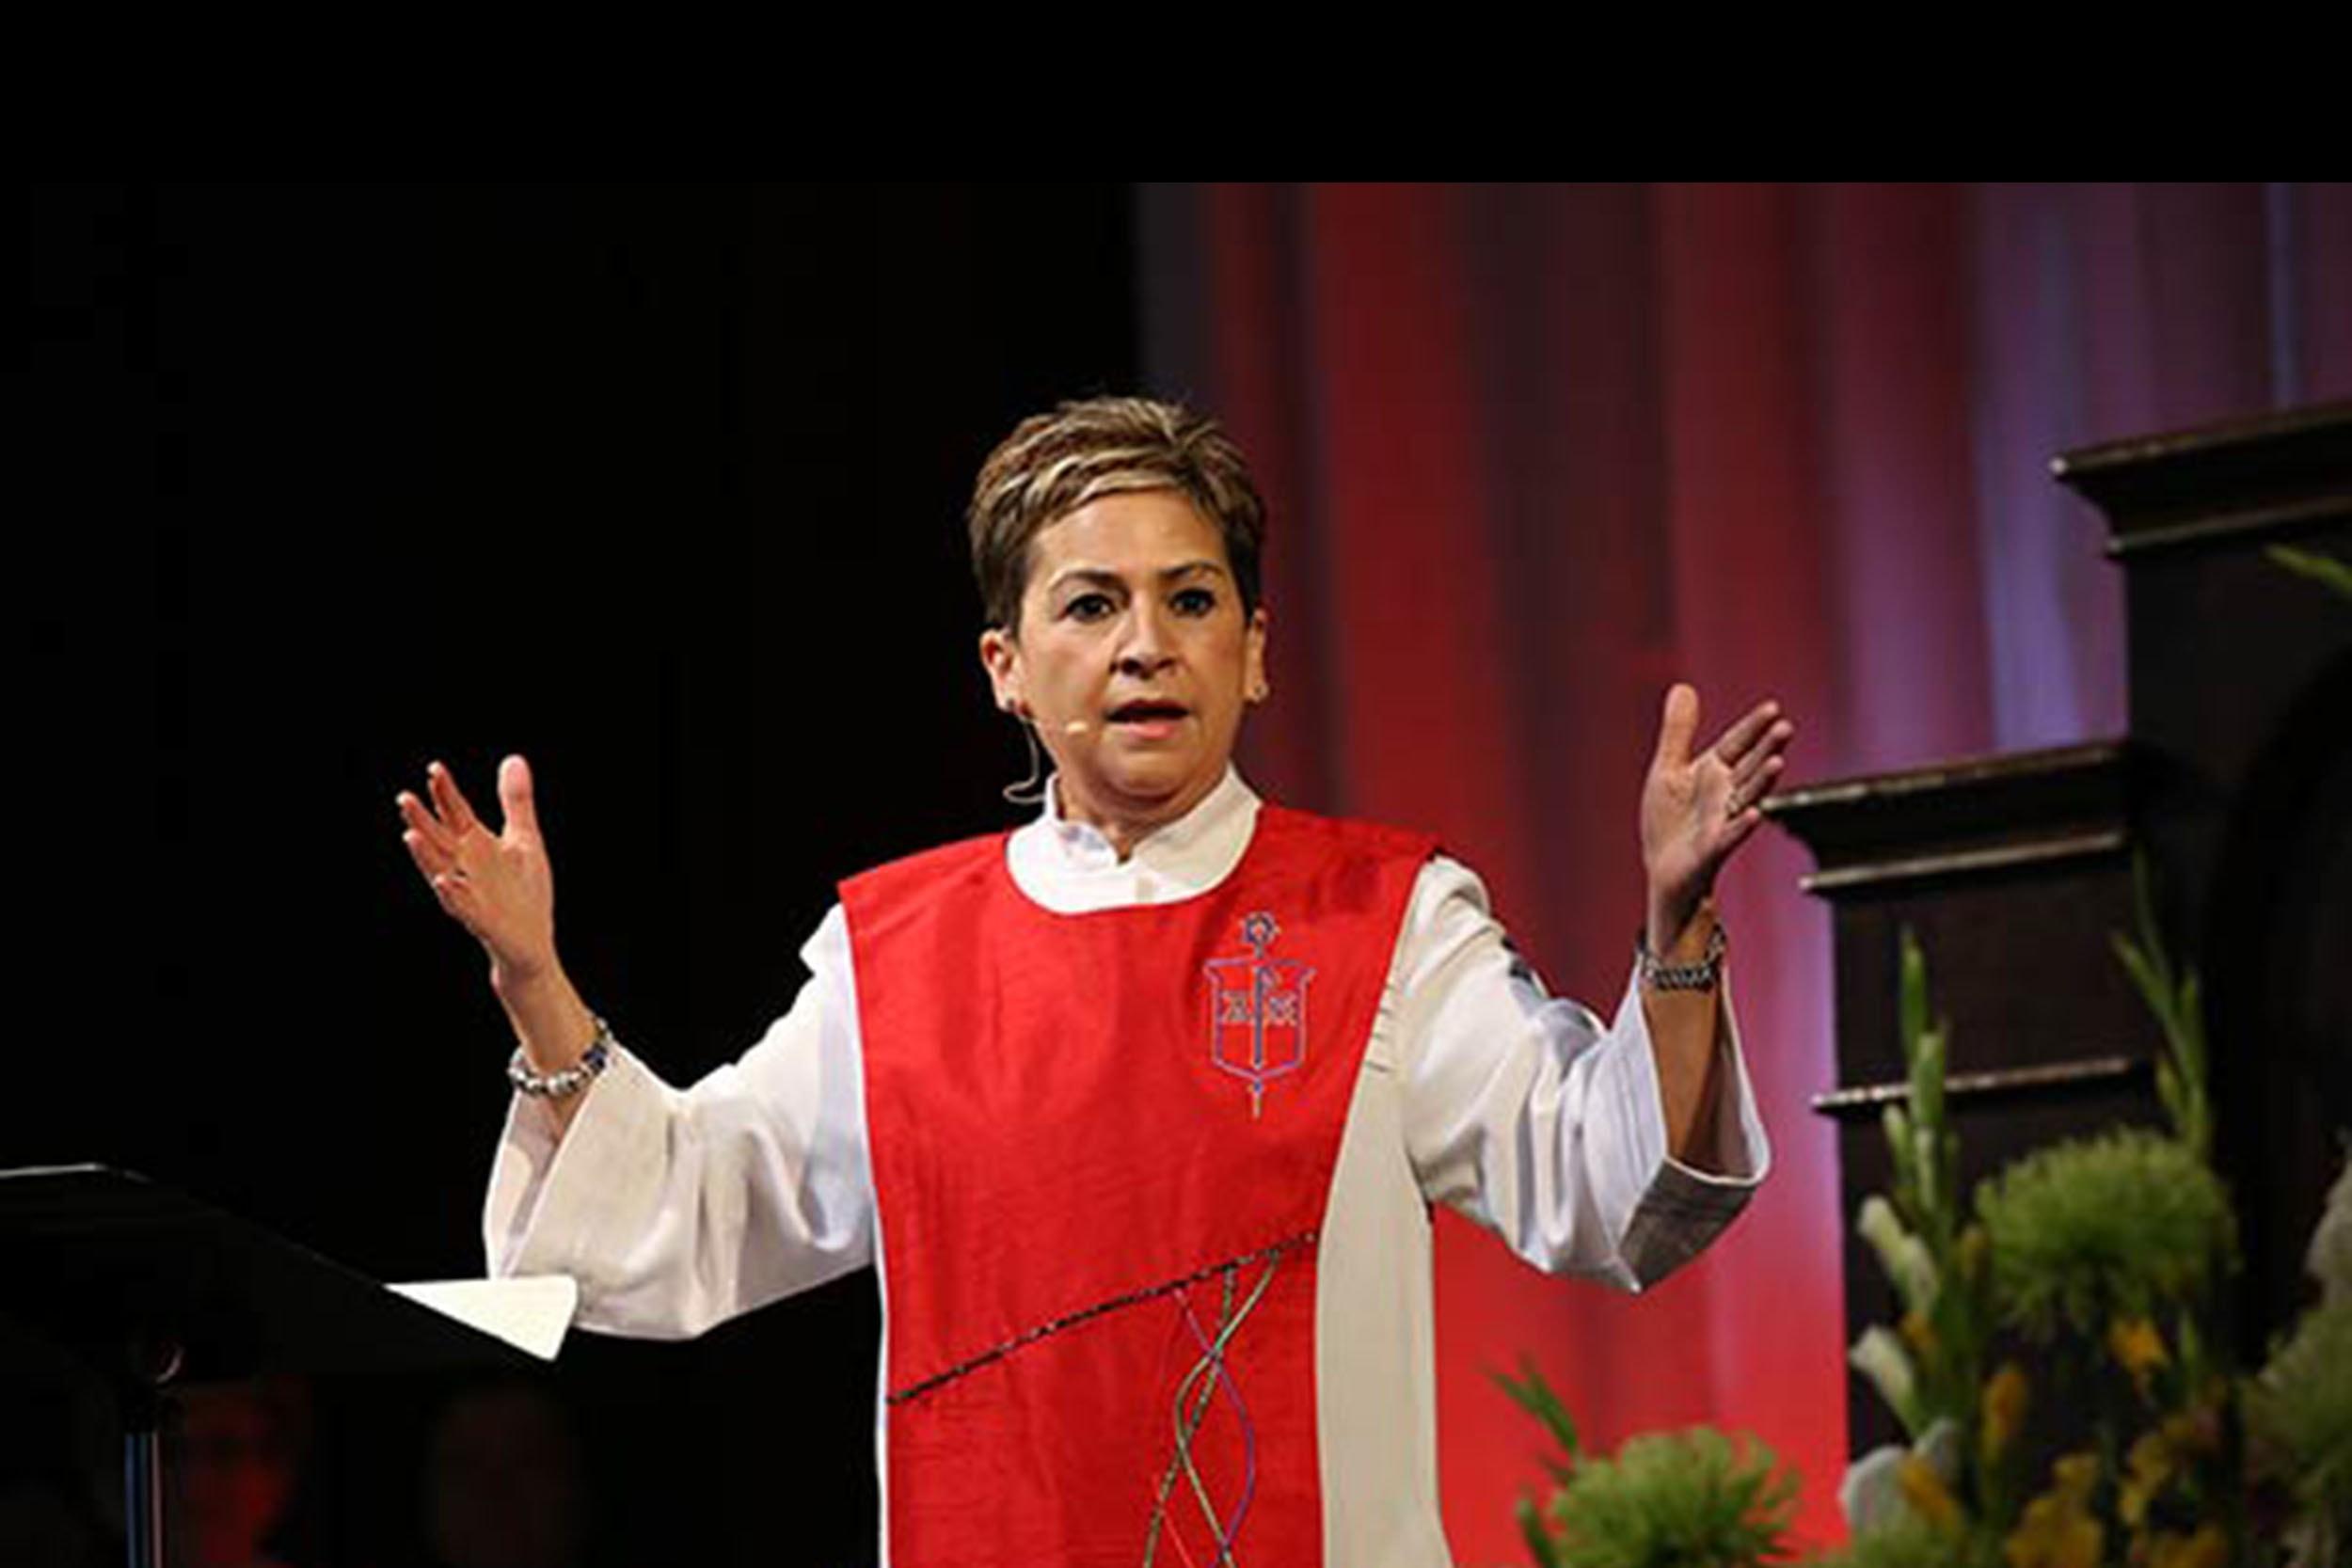 Obispa Cynthia Fierro-Harvey. Foto Mike Dubose, Noticias MU.